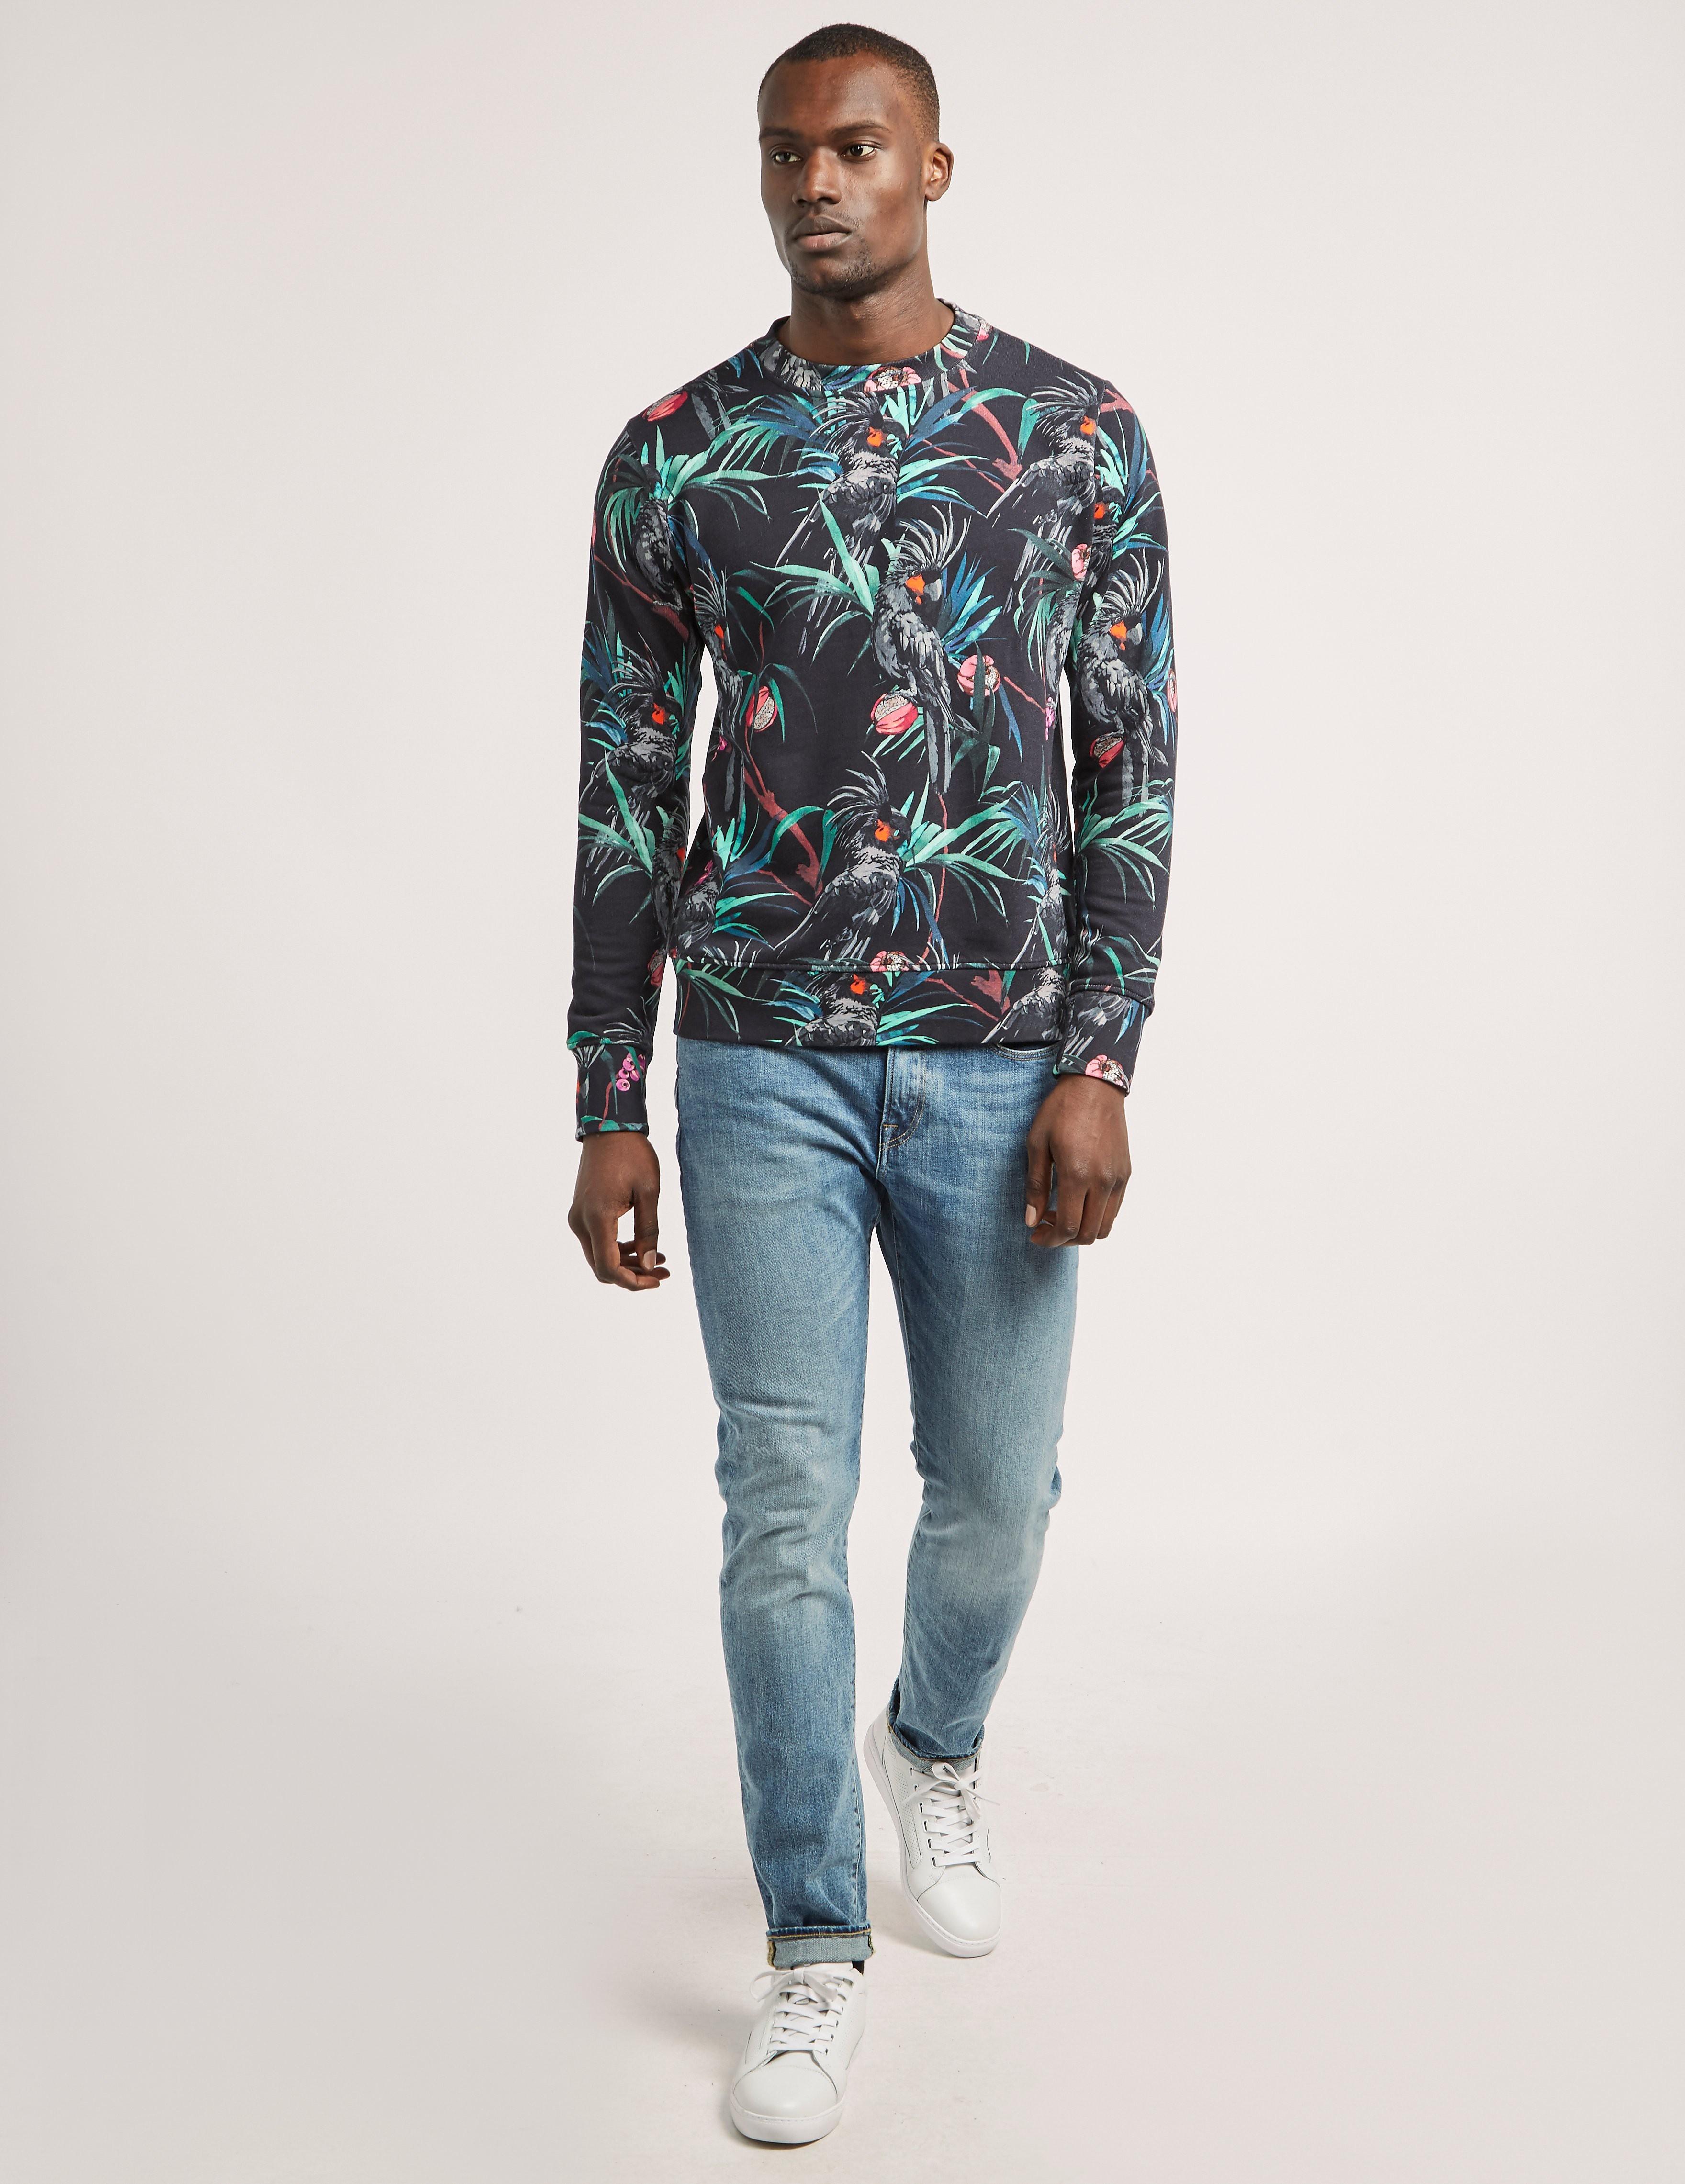 Paul Smith Cockatoo Print Sweatshirt